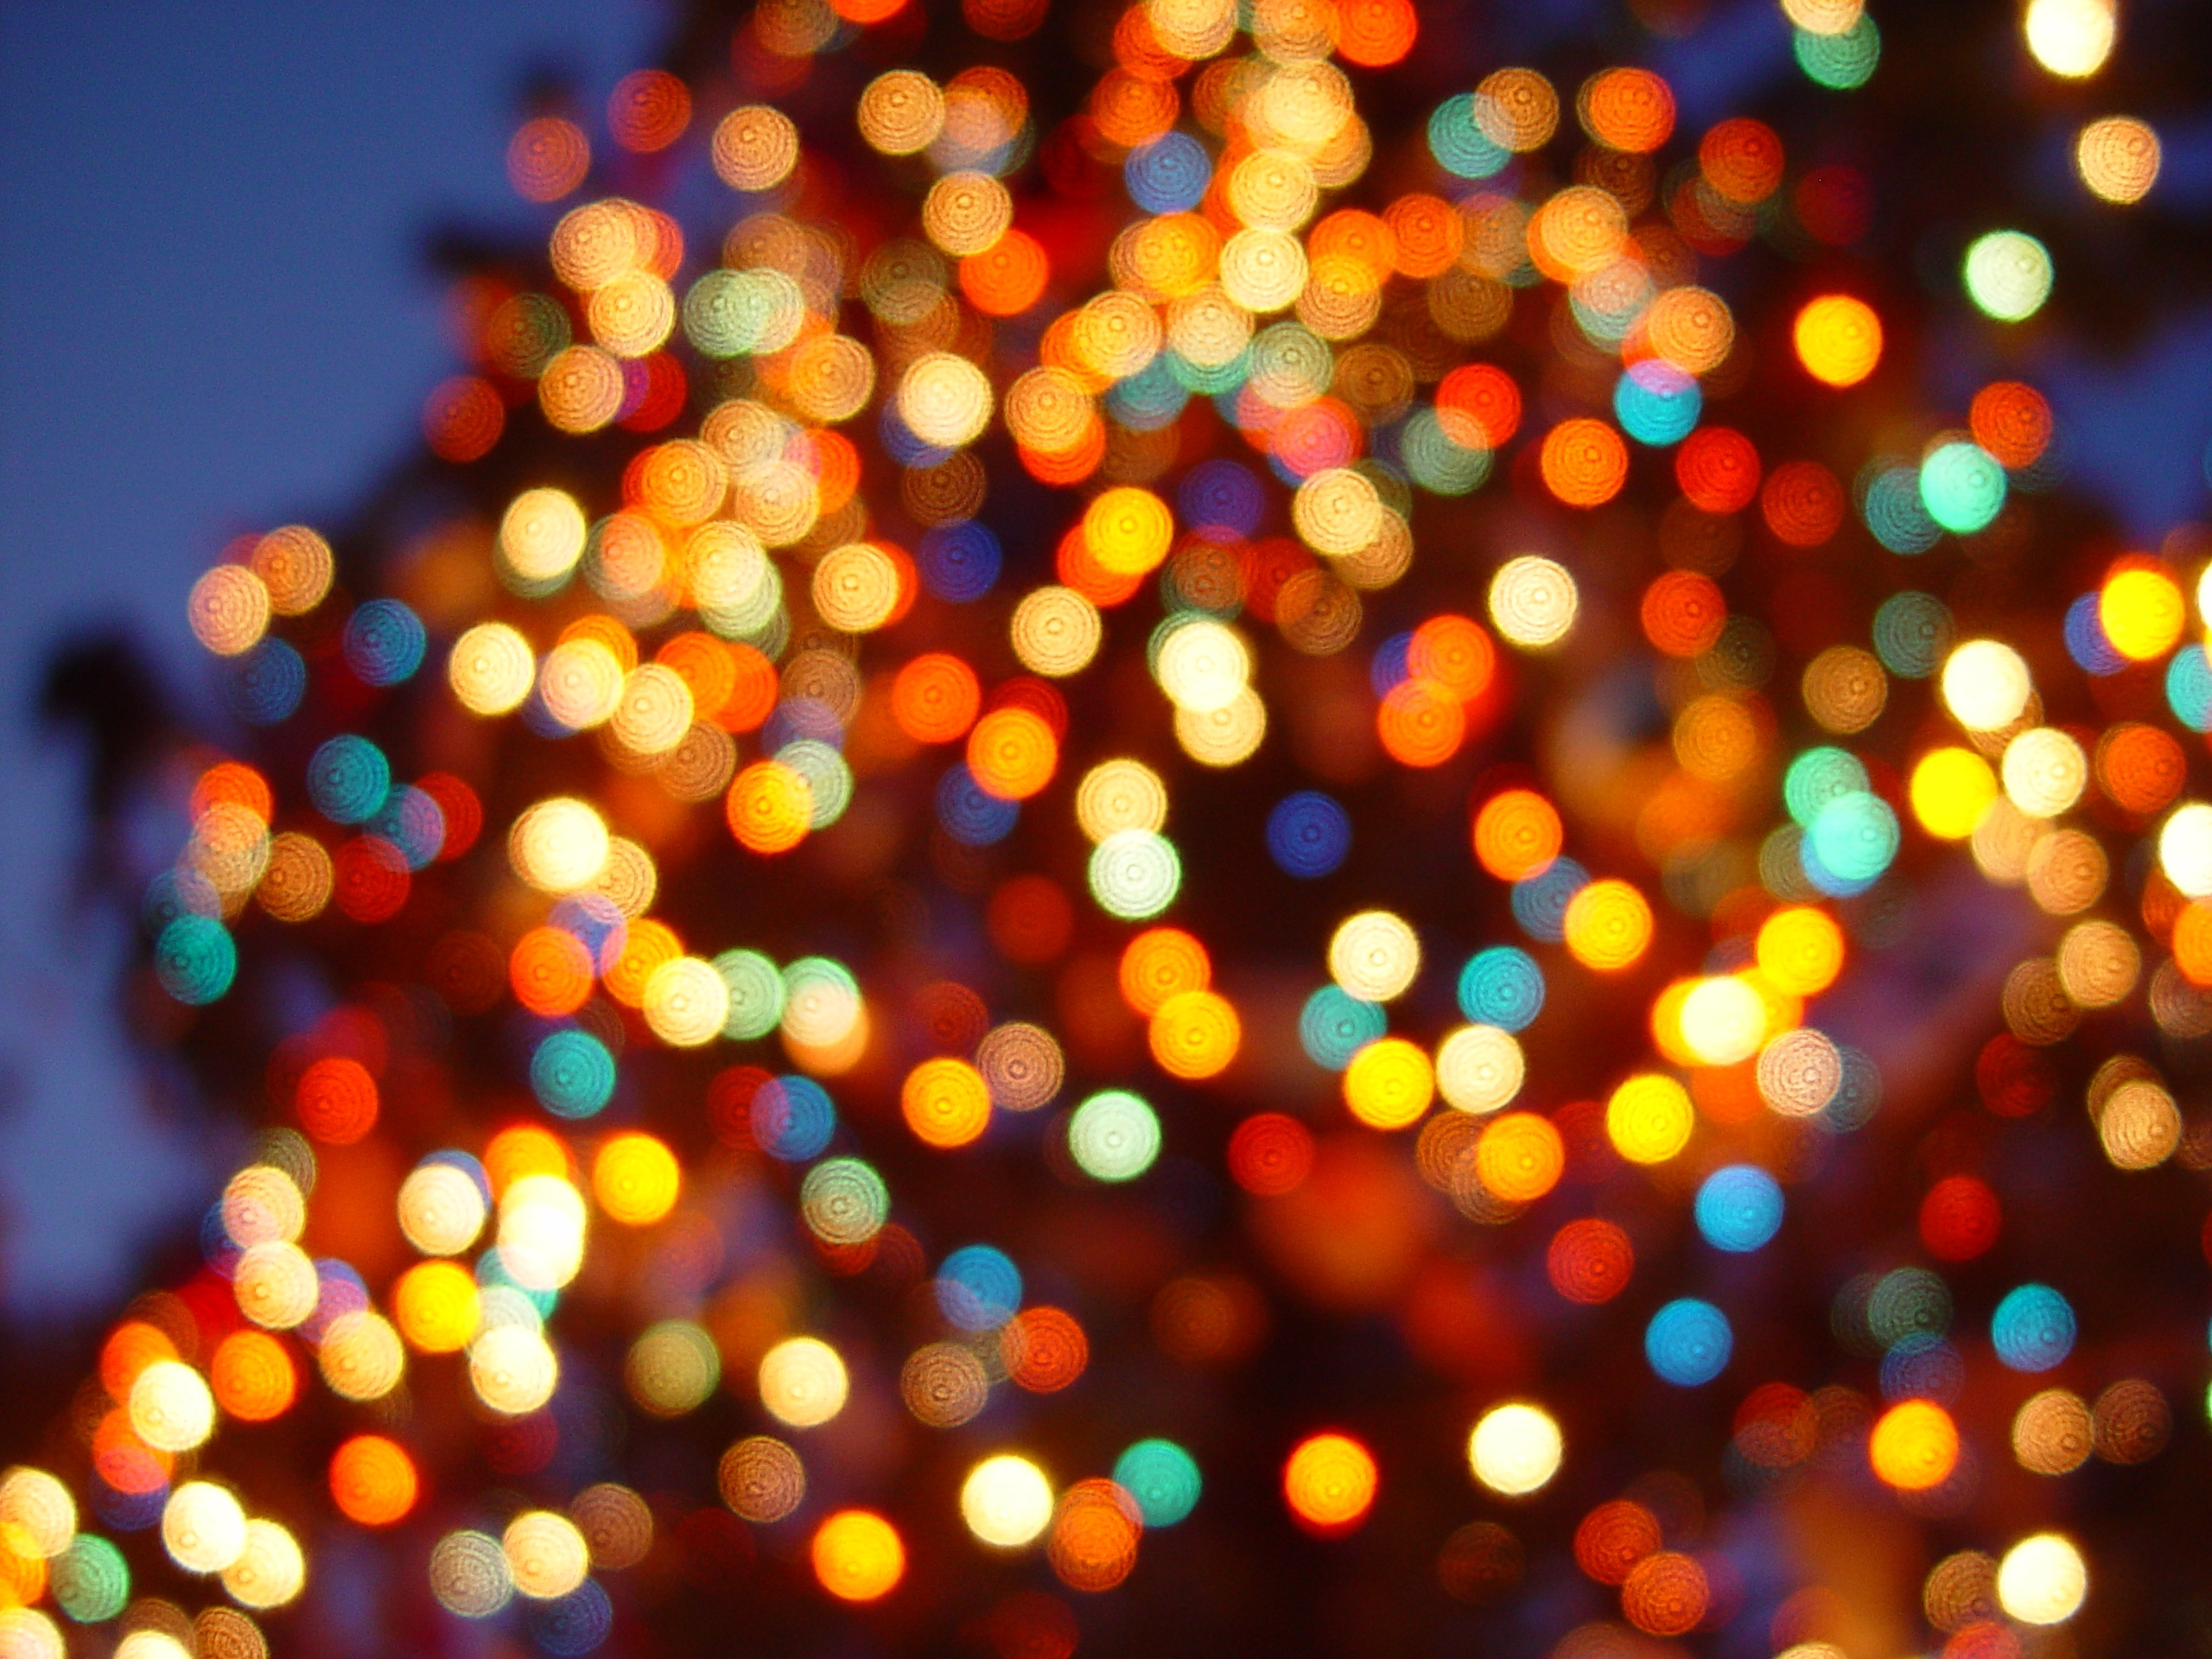 colorful led christmas lights - wallpaper, high definition, high